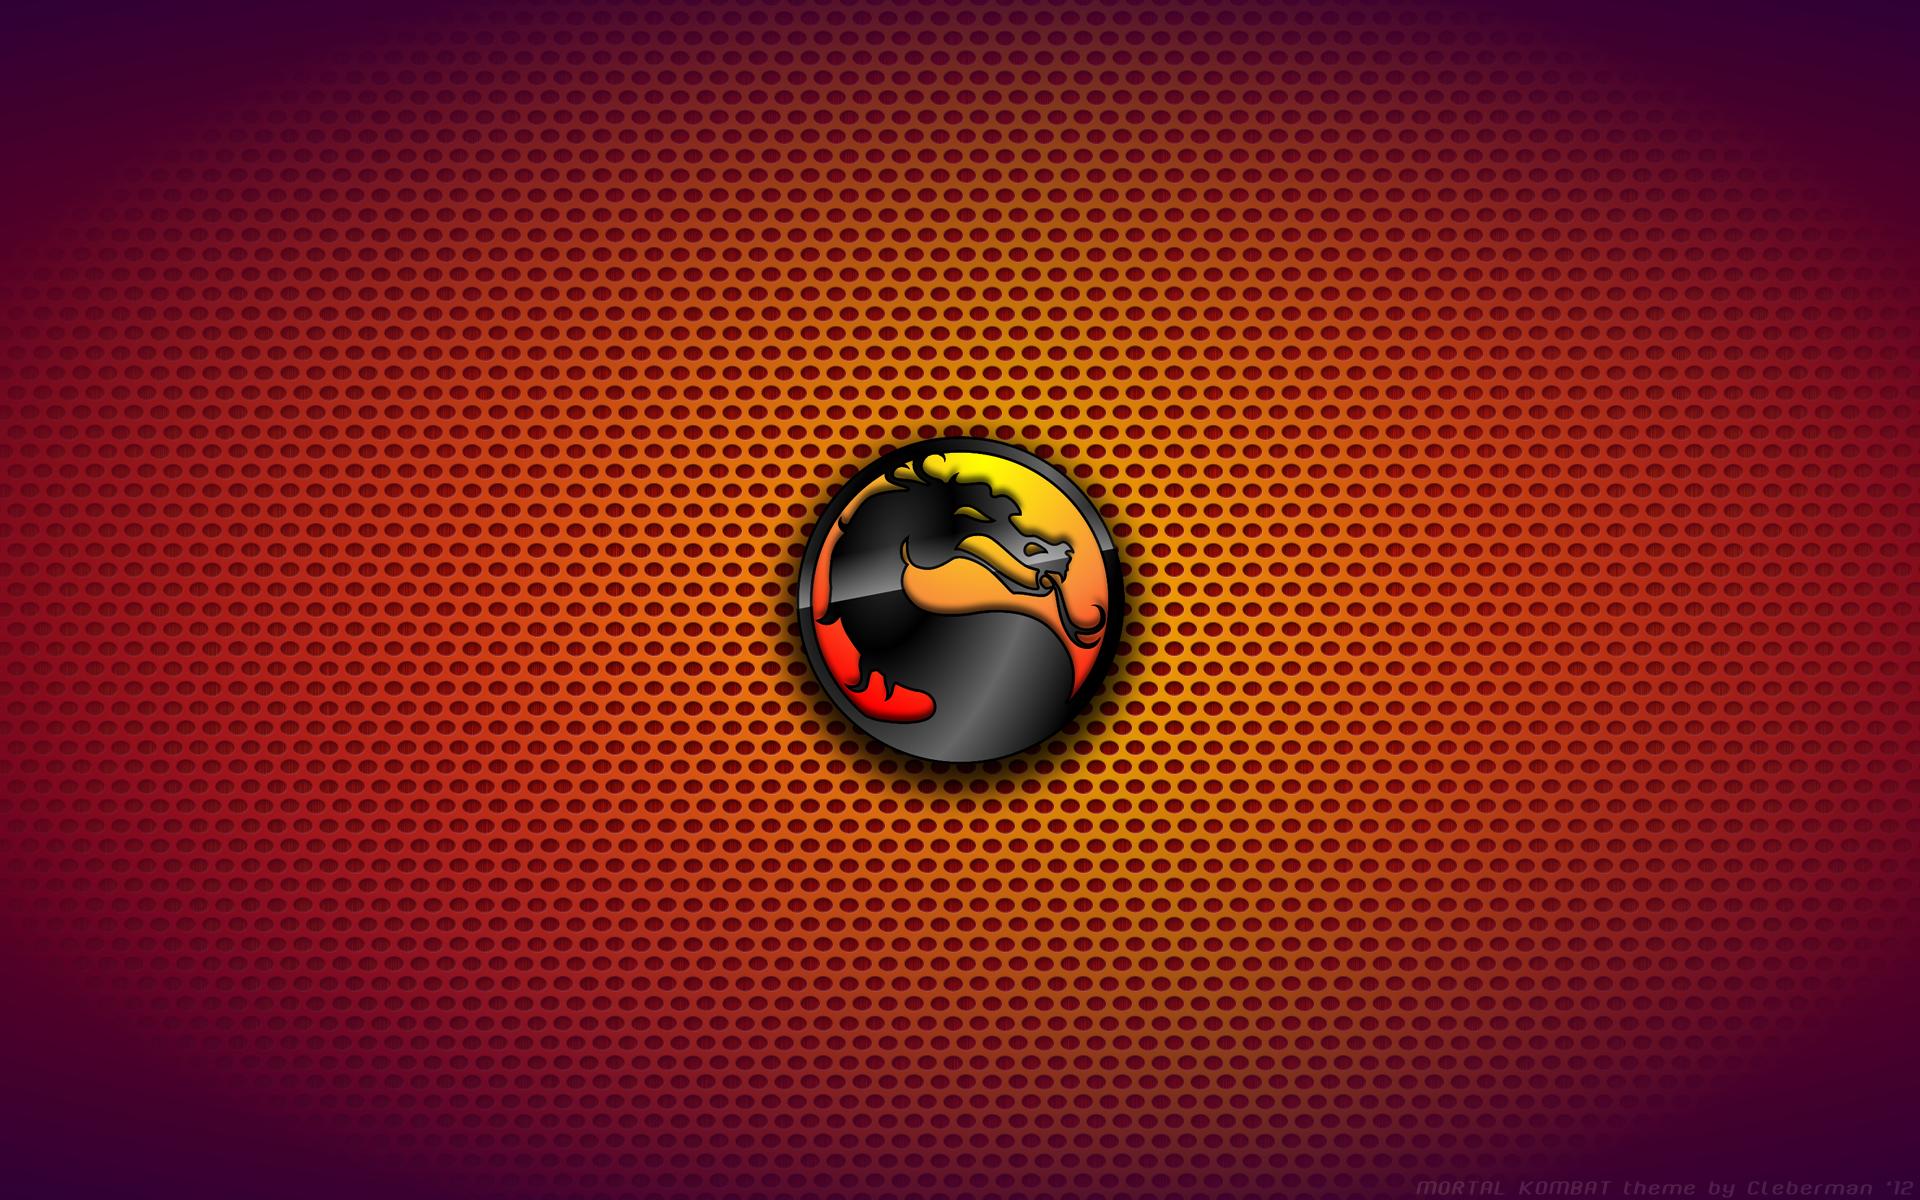 Mortal Kombat HD Wallpaper Background Image 1920x1200